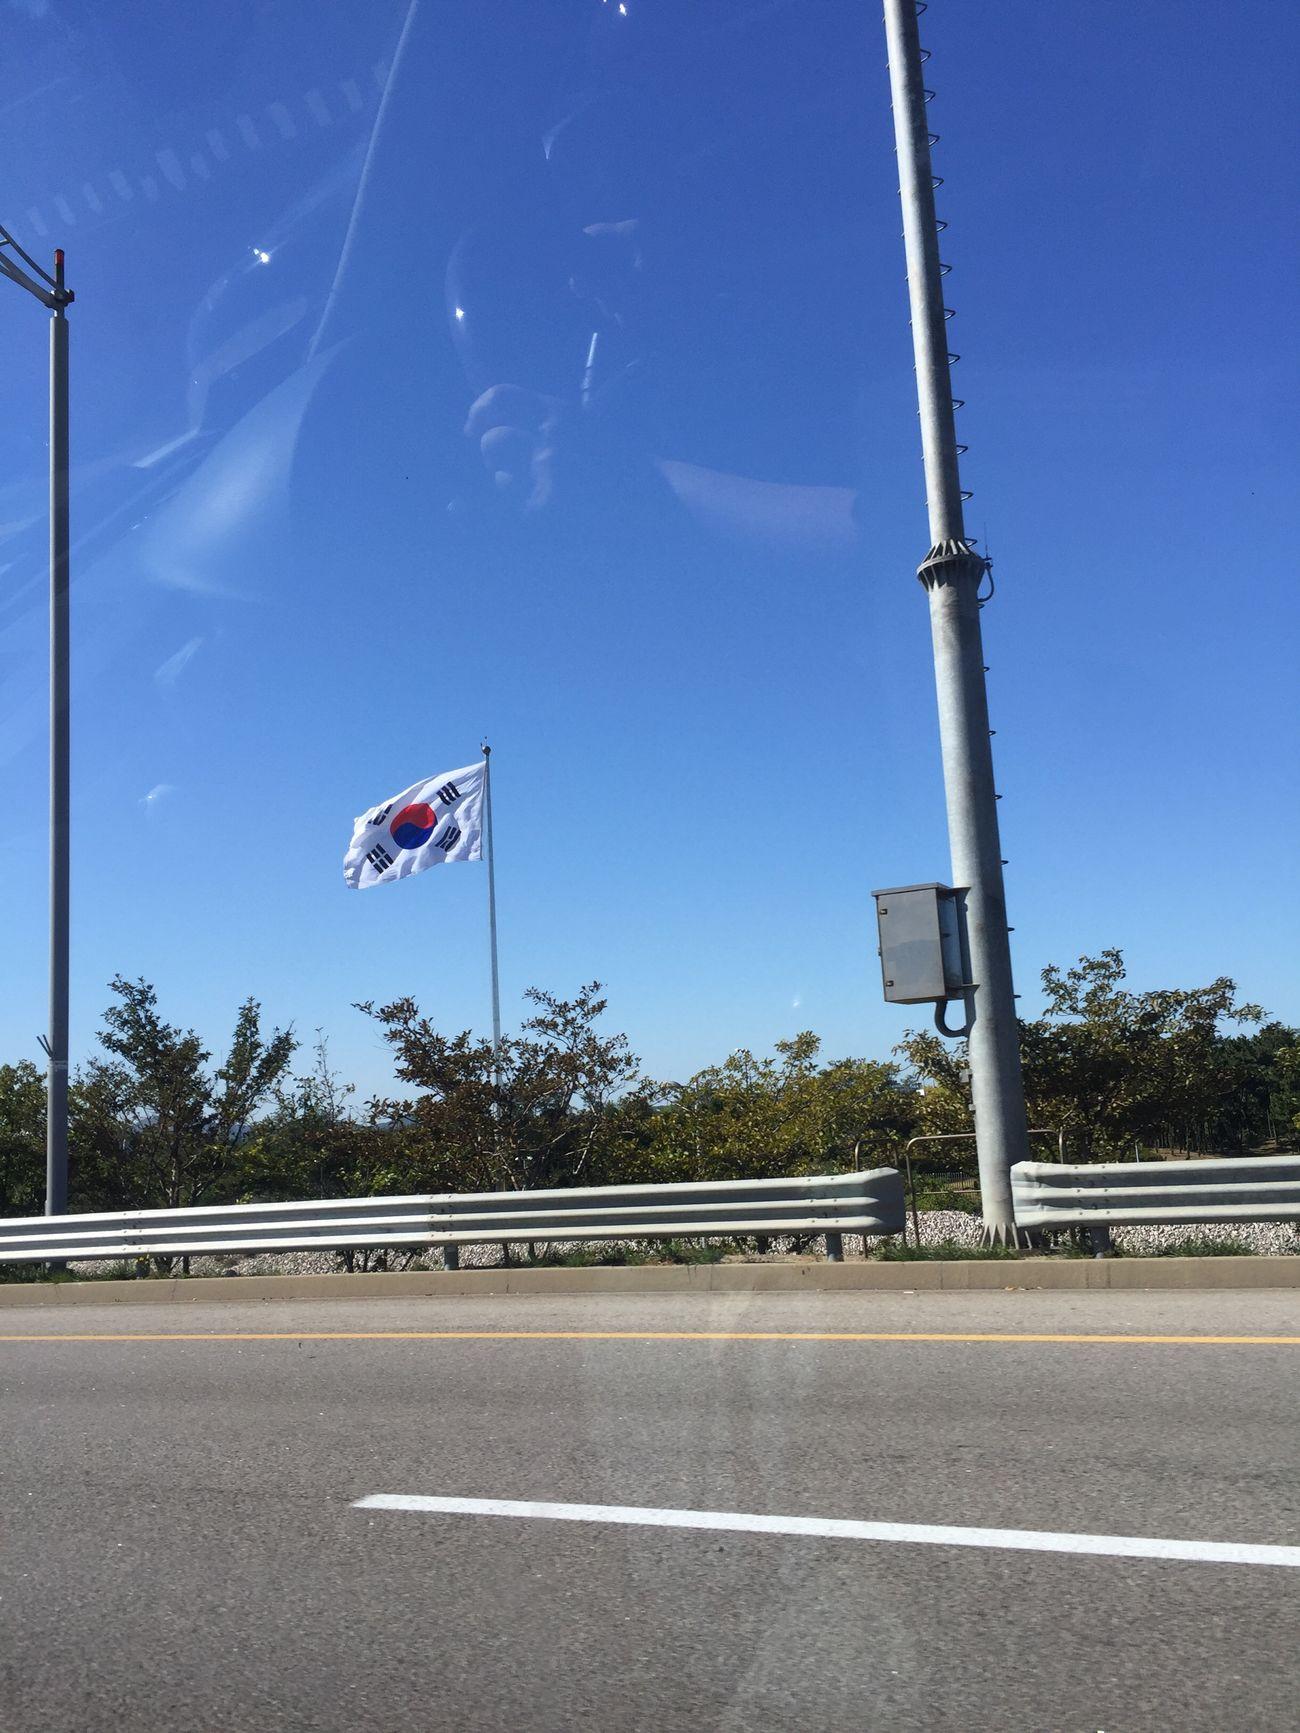 Korea 태극기 인천공항 대한민국 차 바람 맑은하늘 구름